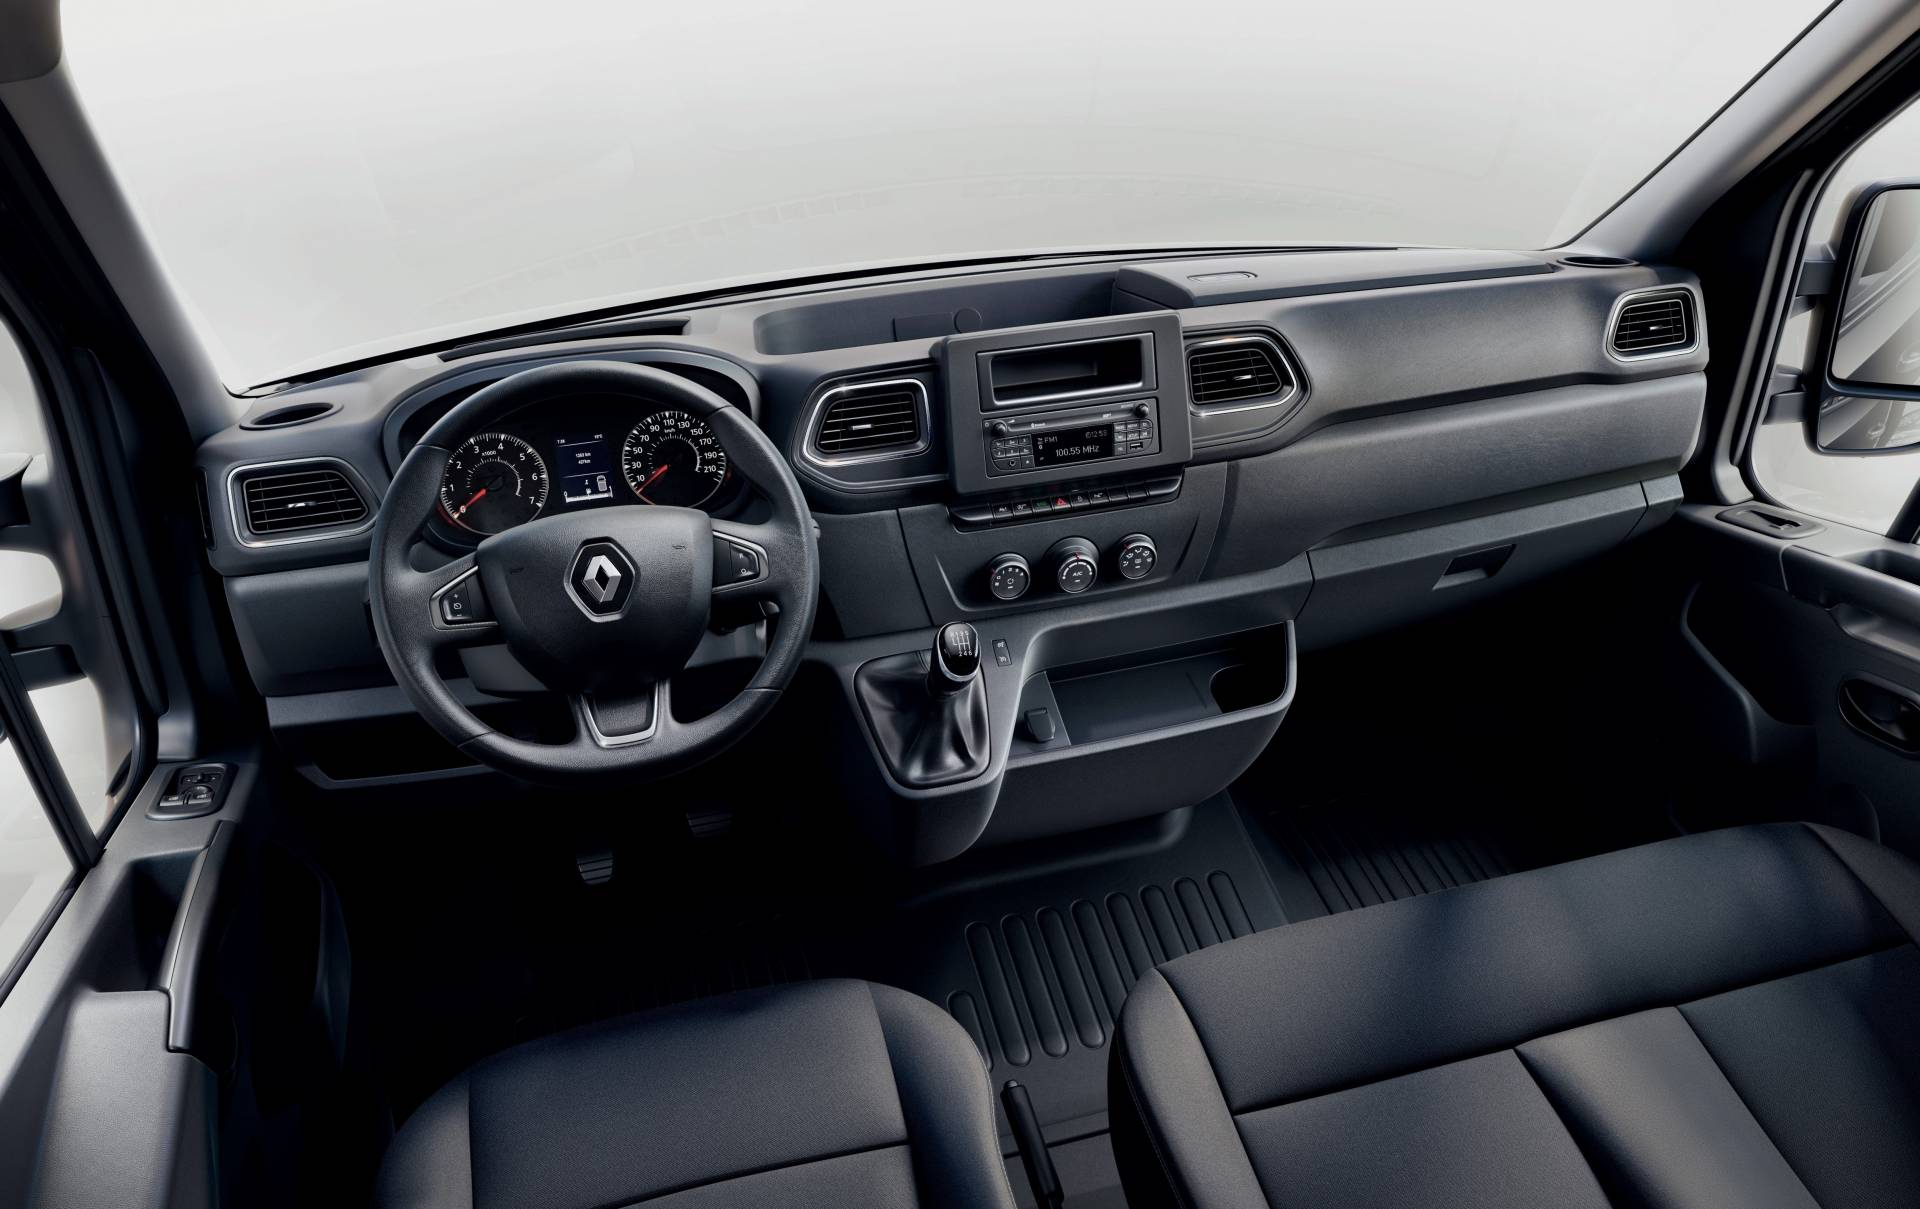 308d9dd2-2019my-renault-master-van-facelift-7